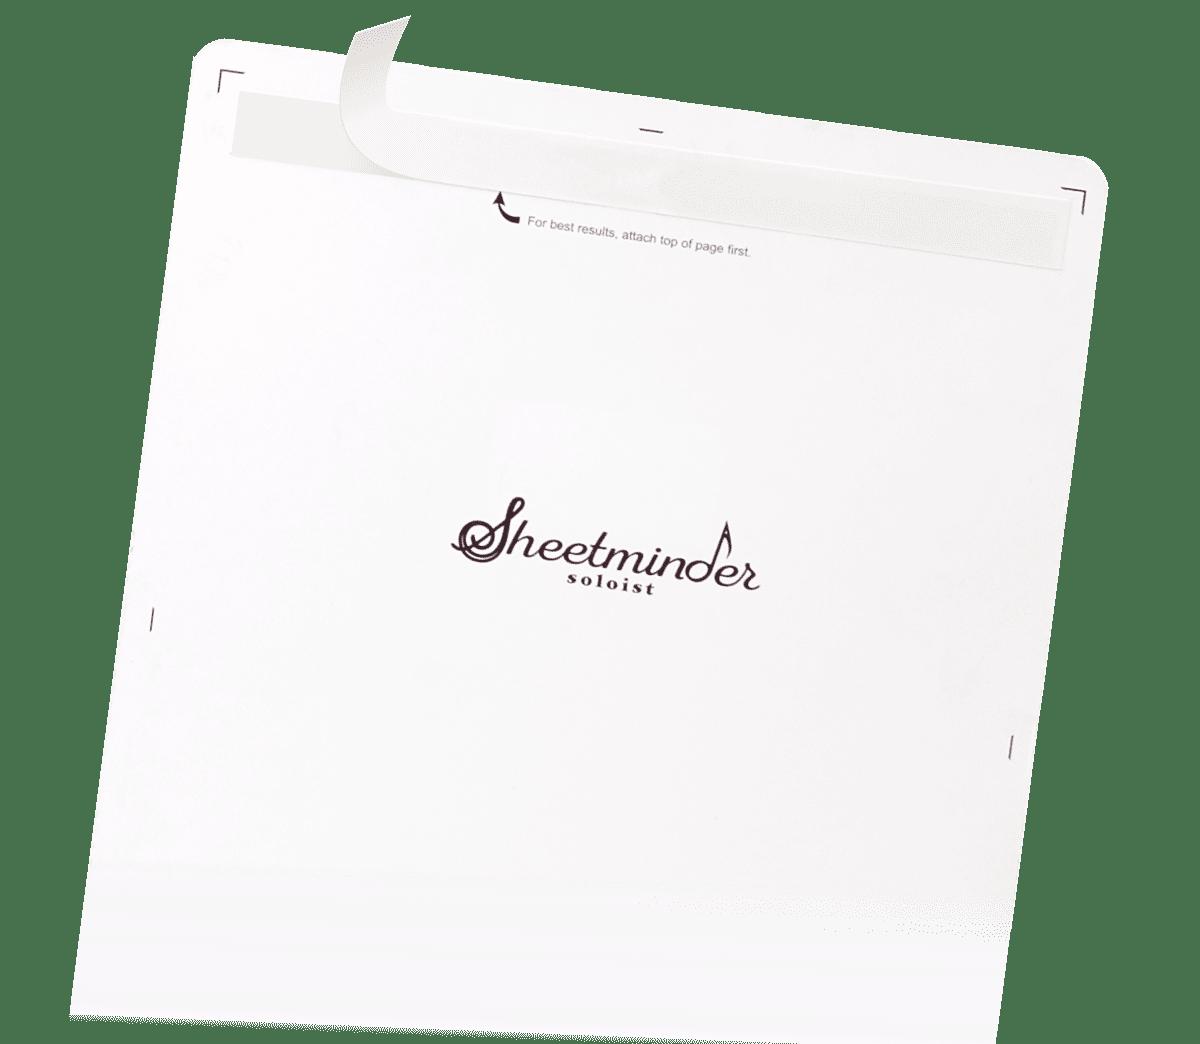 Sheetminder Soloist 5-Pack - adhenis opt